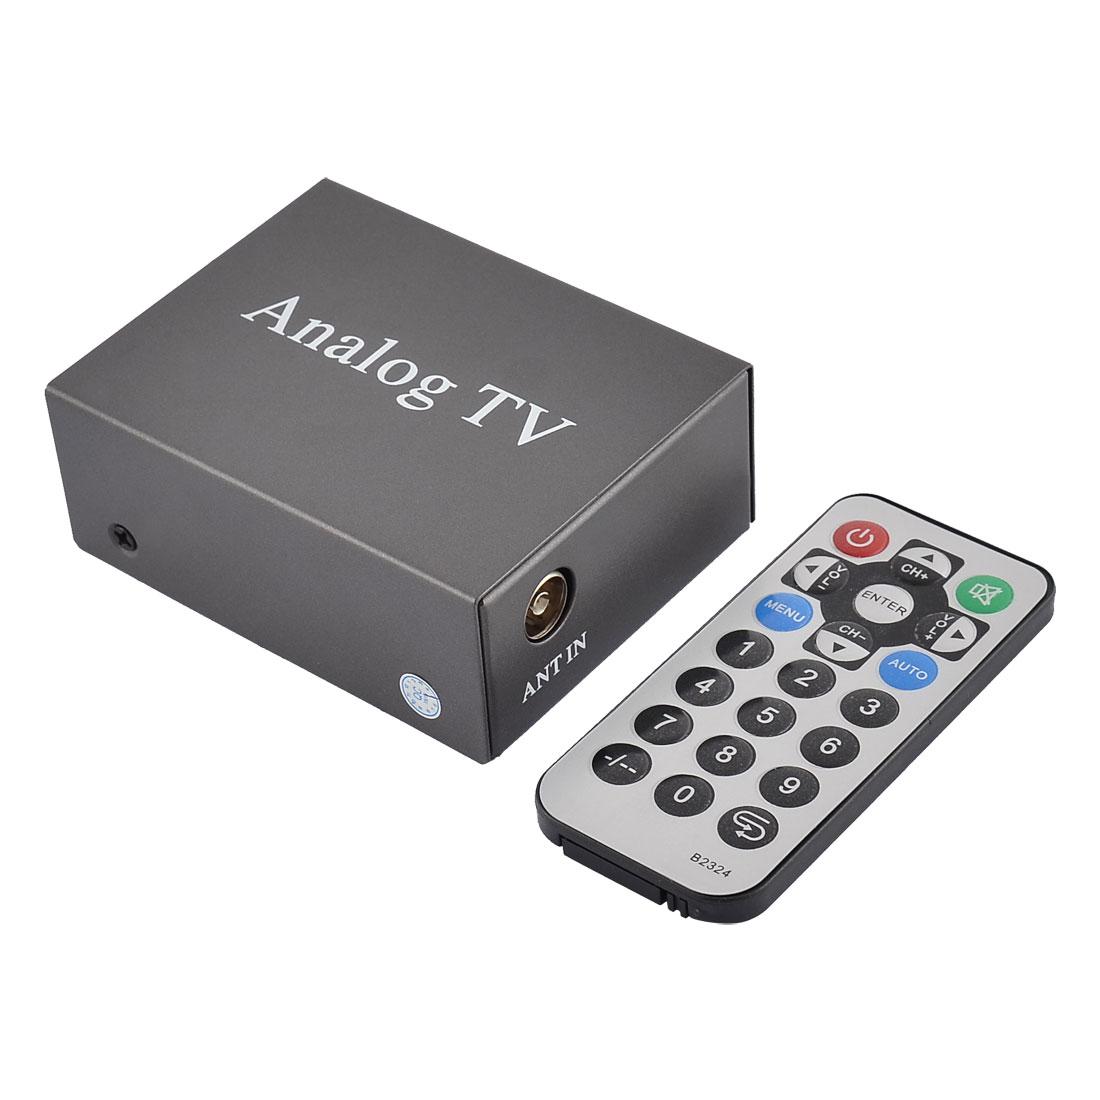 Universal Car Streaming Media DVD Player Game Play Station Preload Analog TV Box